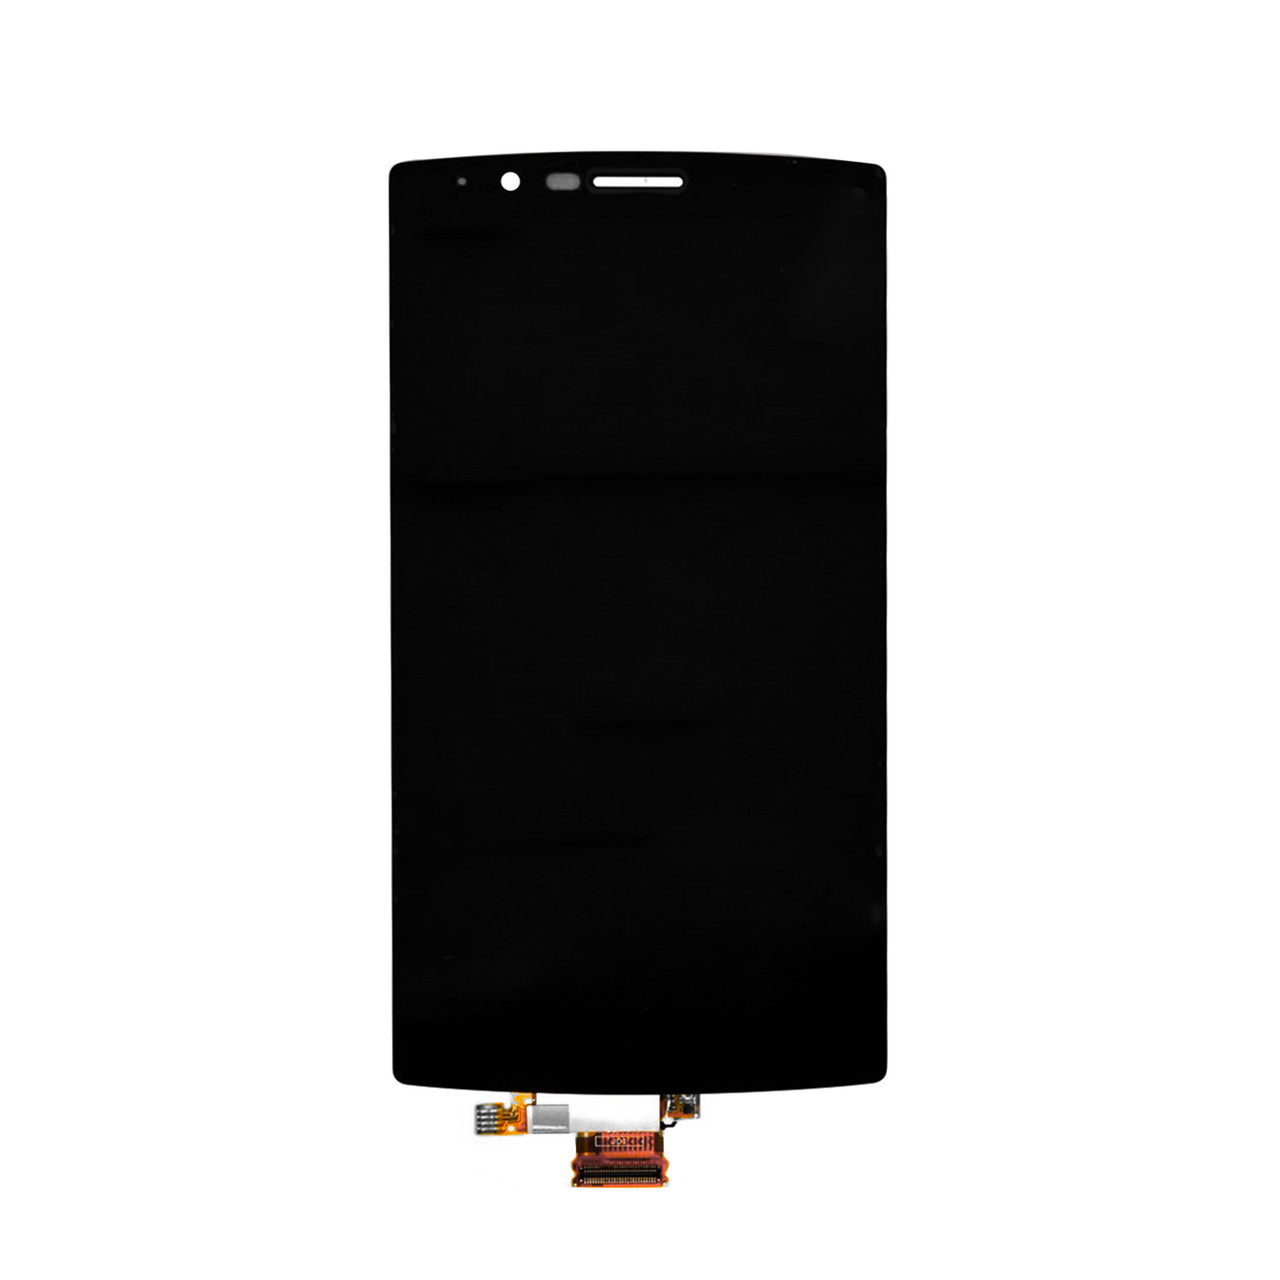 Дисплей LG G4 H818 в сборе Black (32)